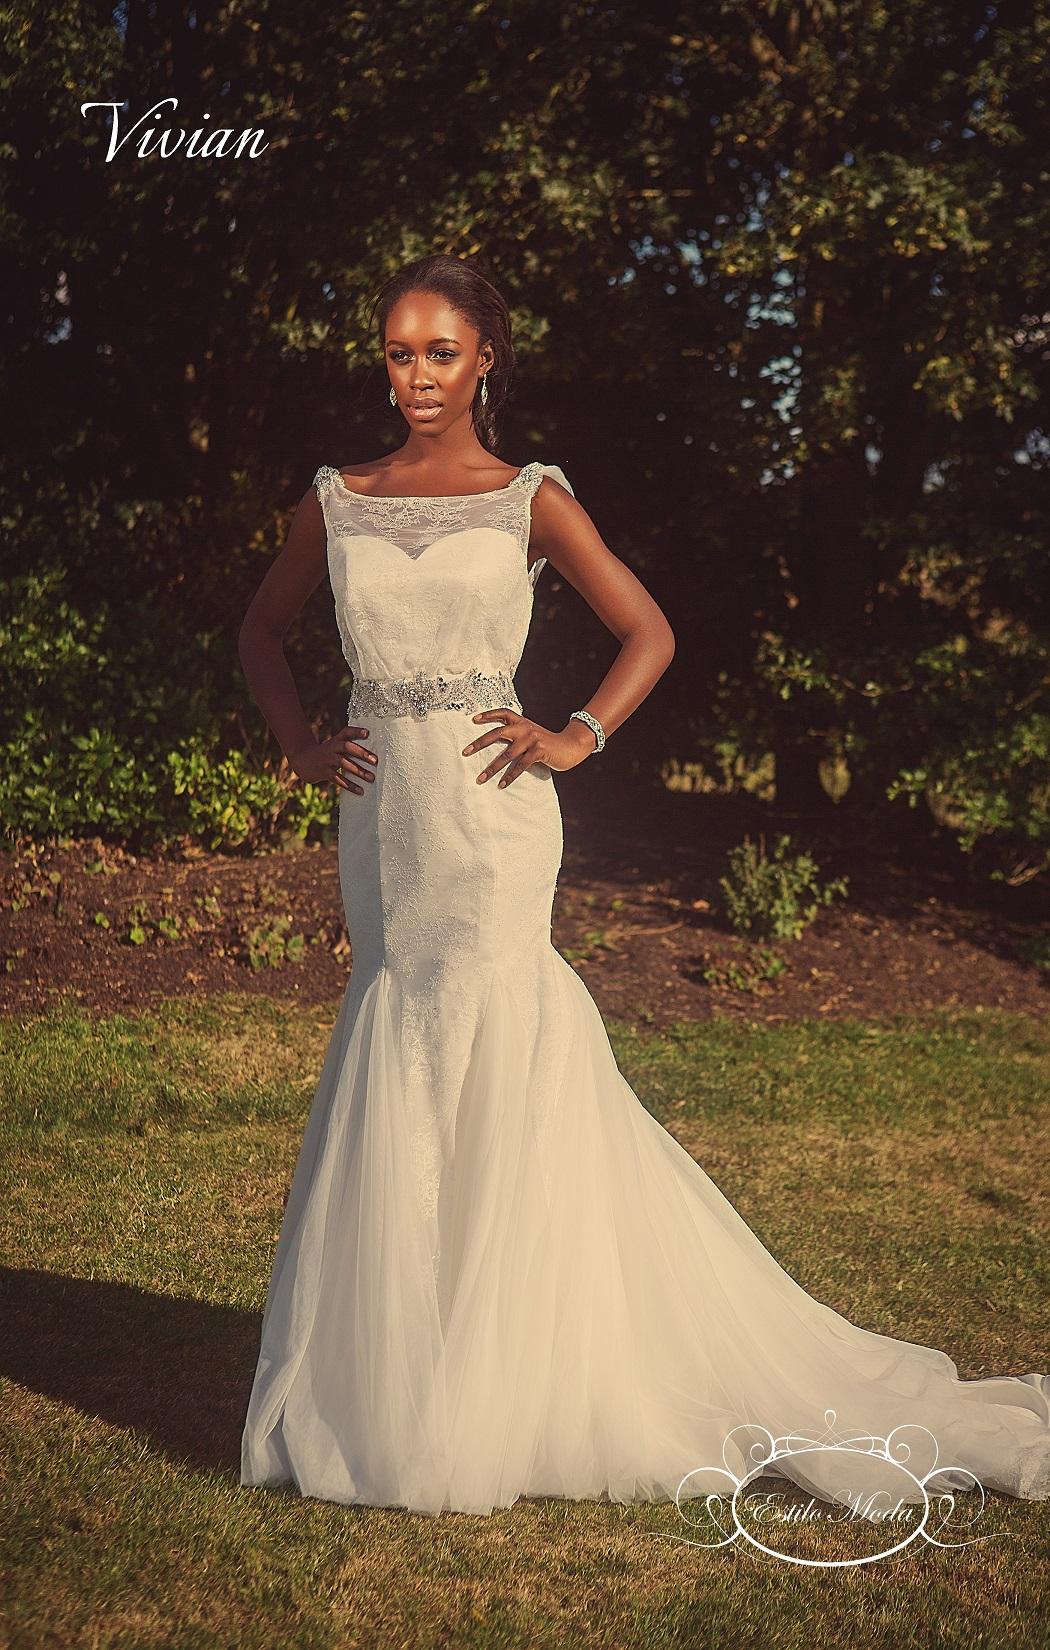 e050c1e553 lace mermaid wedding dress with illusion neckline